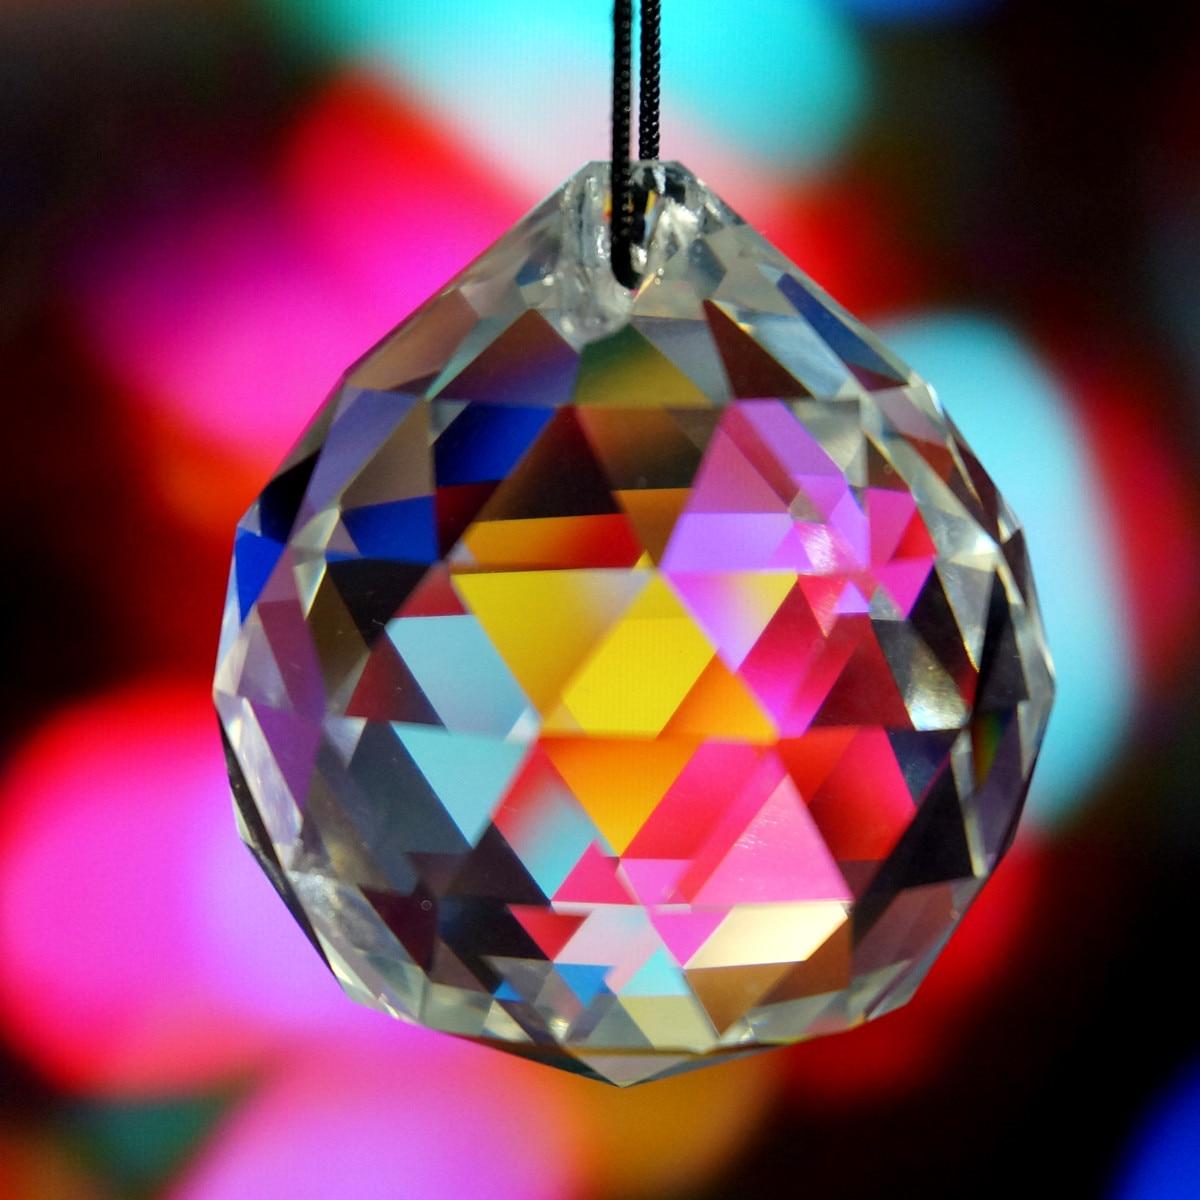 Online Buy Wholesale glass chandelier prisms from China glass – Glass Prisms for Chandeliers